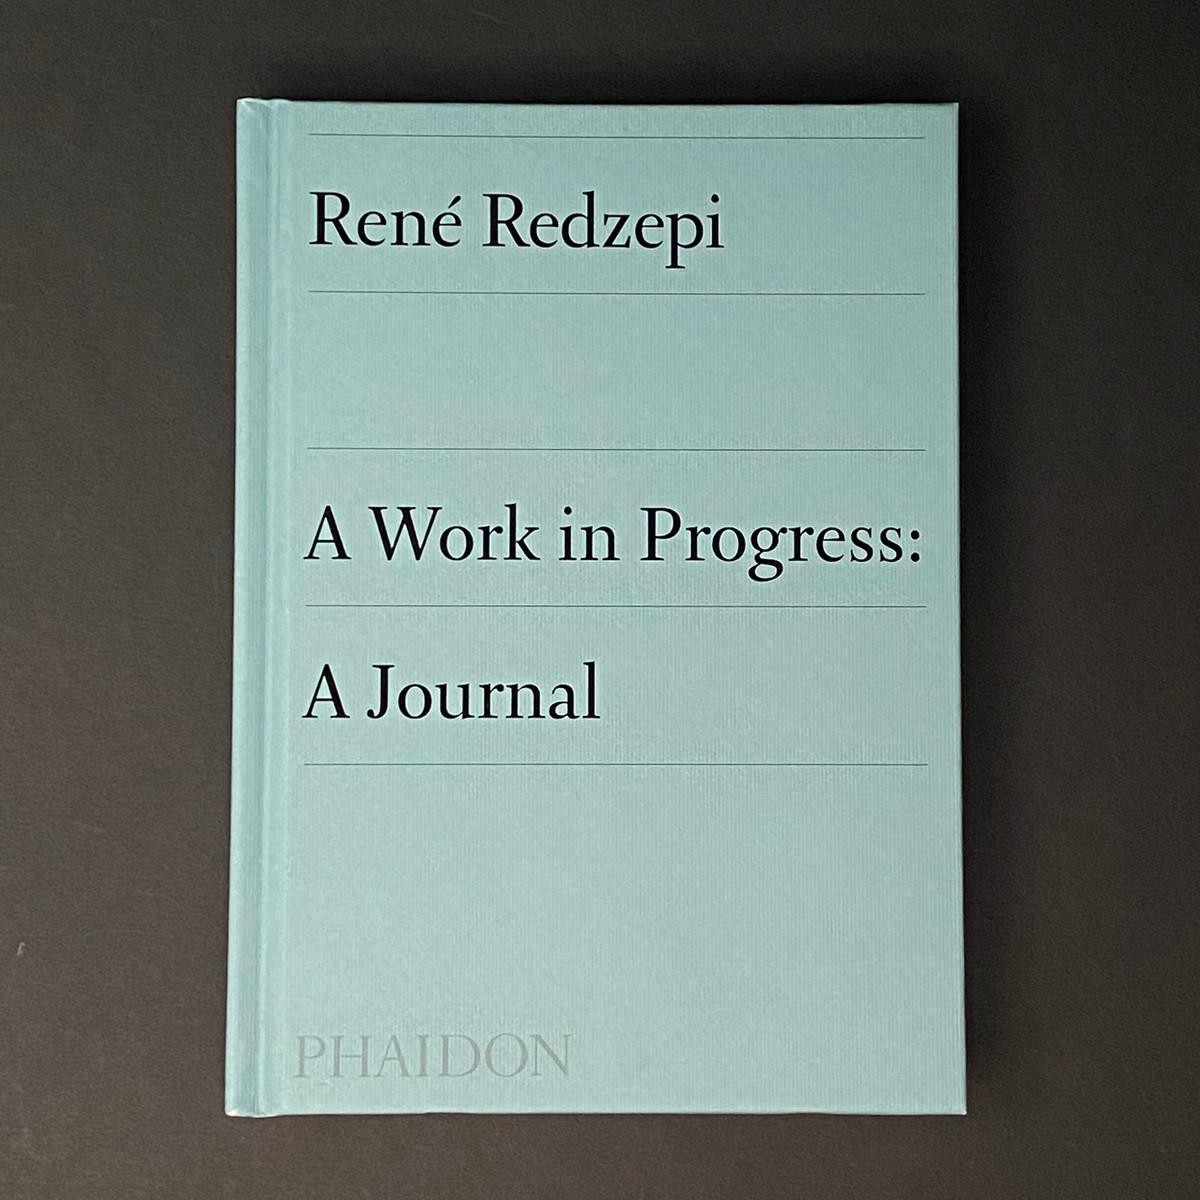 A Work in Progress: A Journal | Rene Redzepi